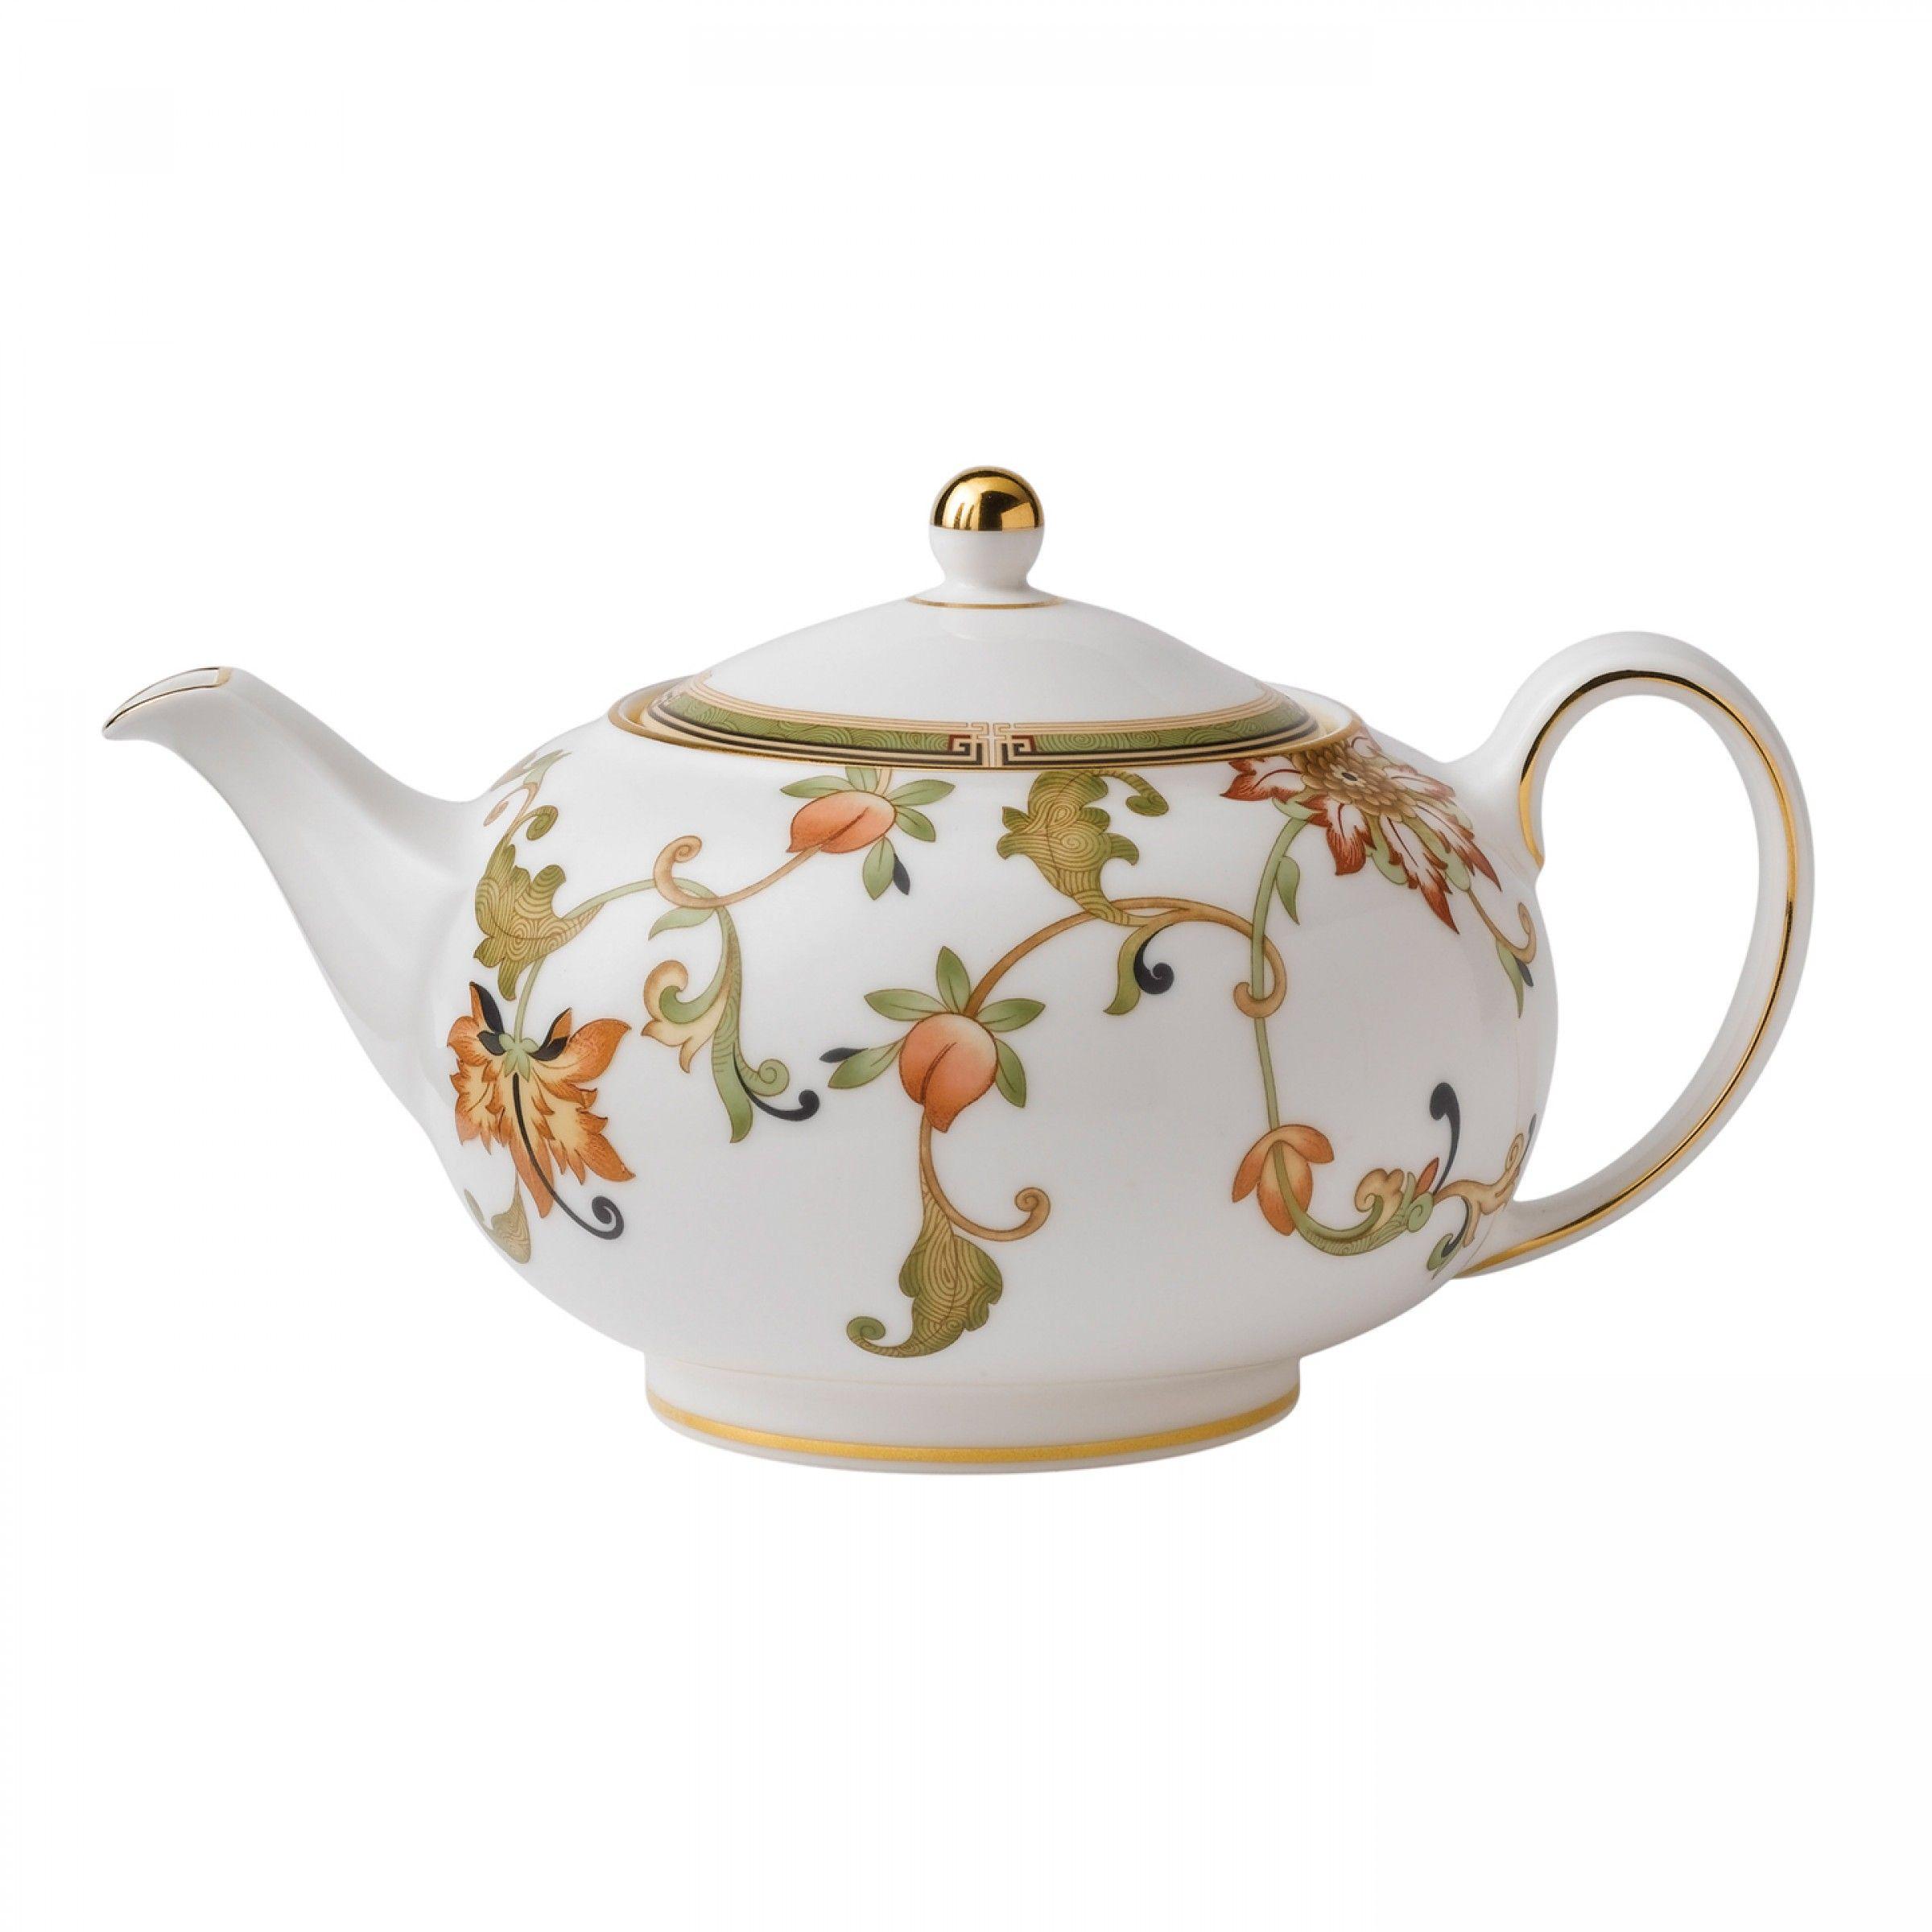 Oberon Teapot In 2020 With Images Tea Pots Tea Bone China Teapots